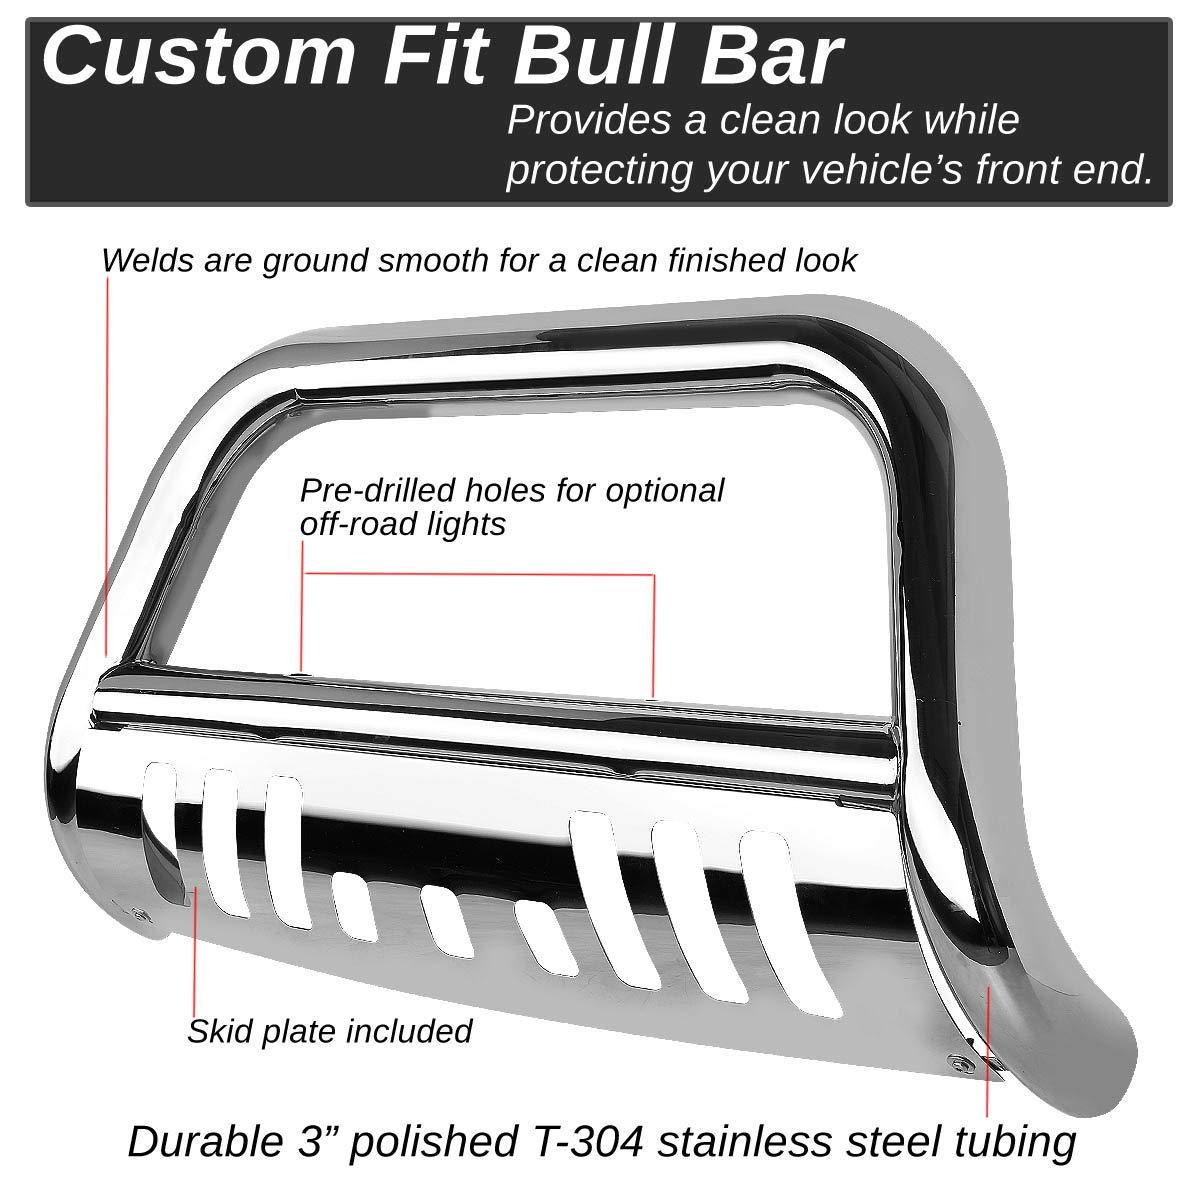 Black For Chevy Silverado//GMC Sierra GMT800 3 Bumper Push Bull Bar+Removable Skid Plate